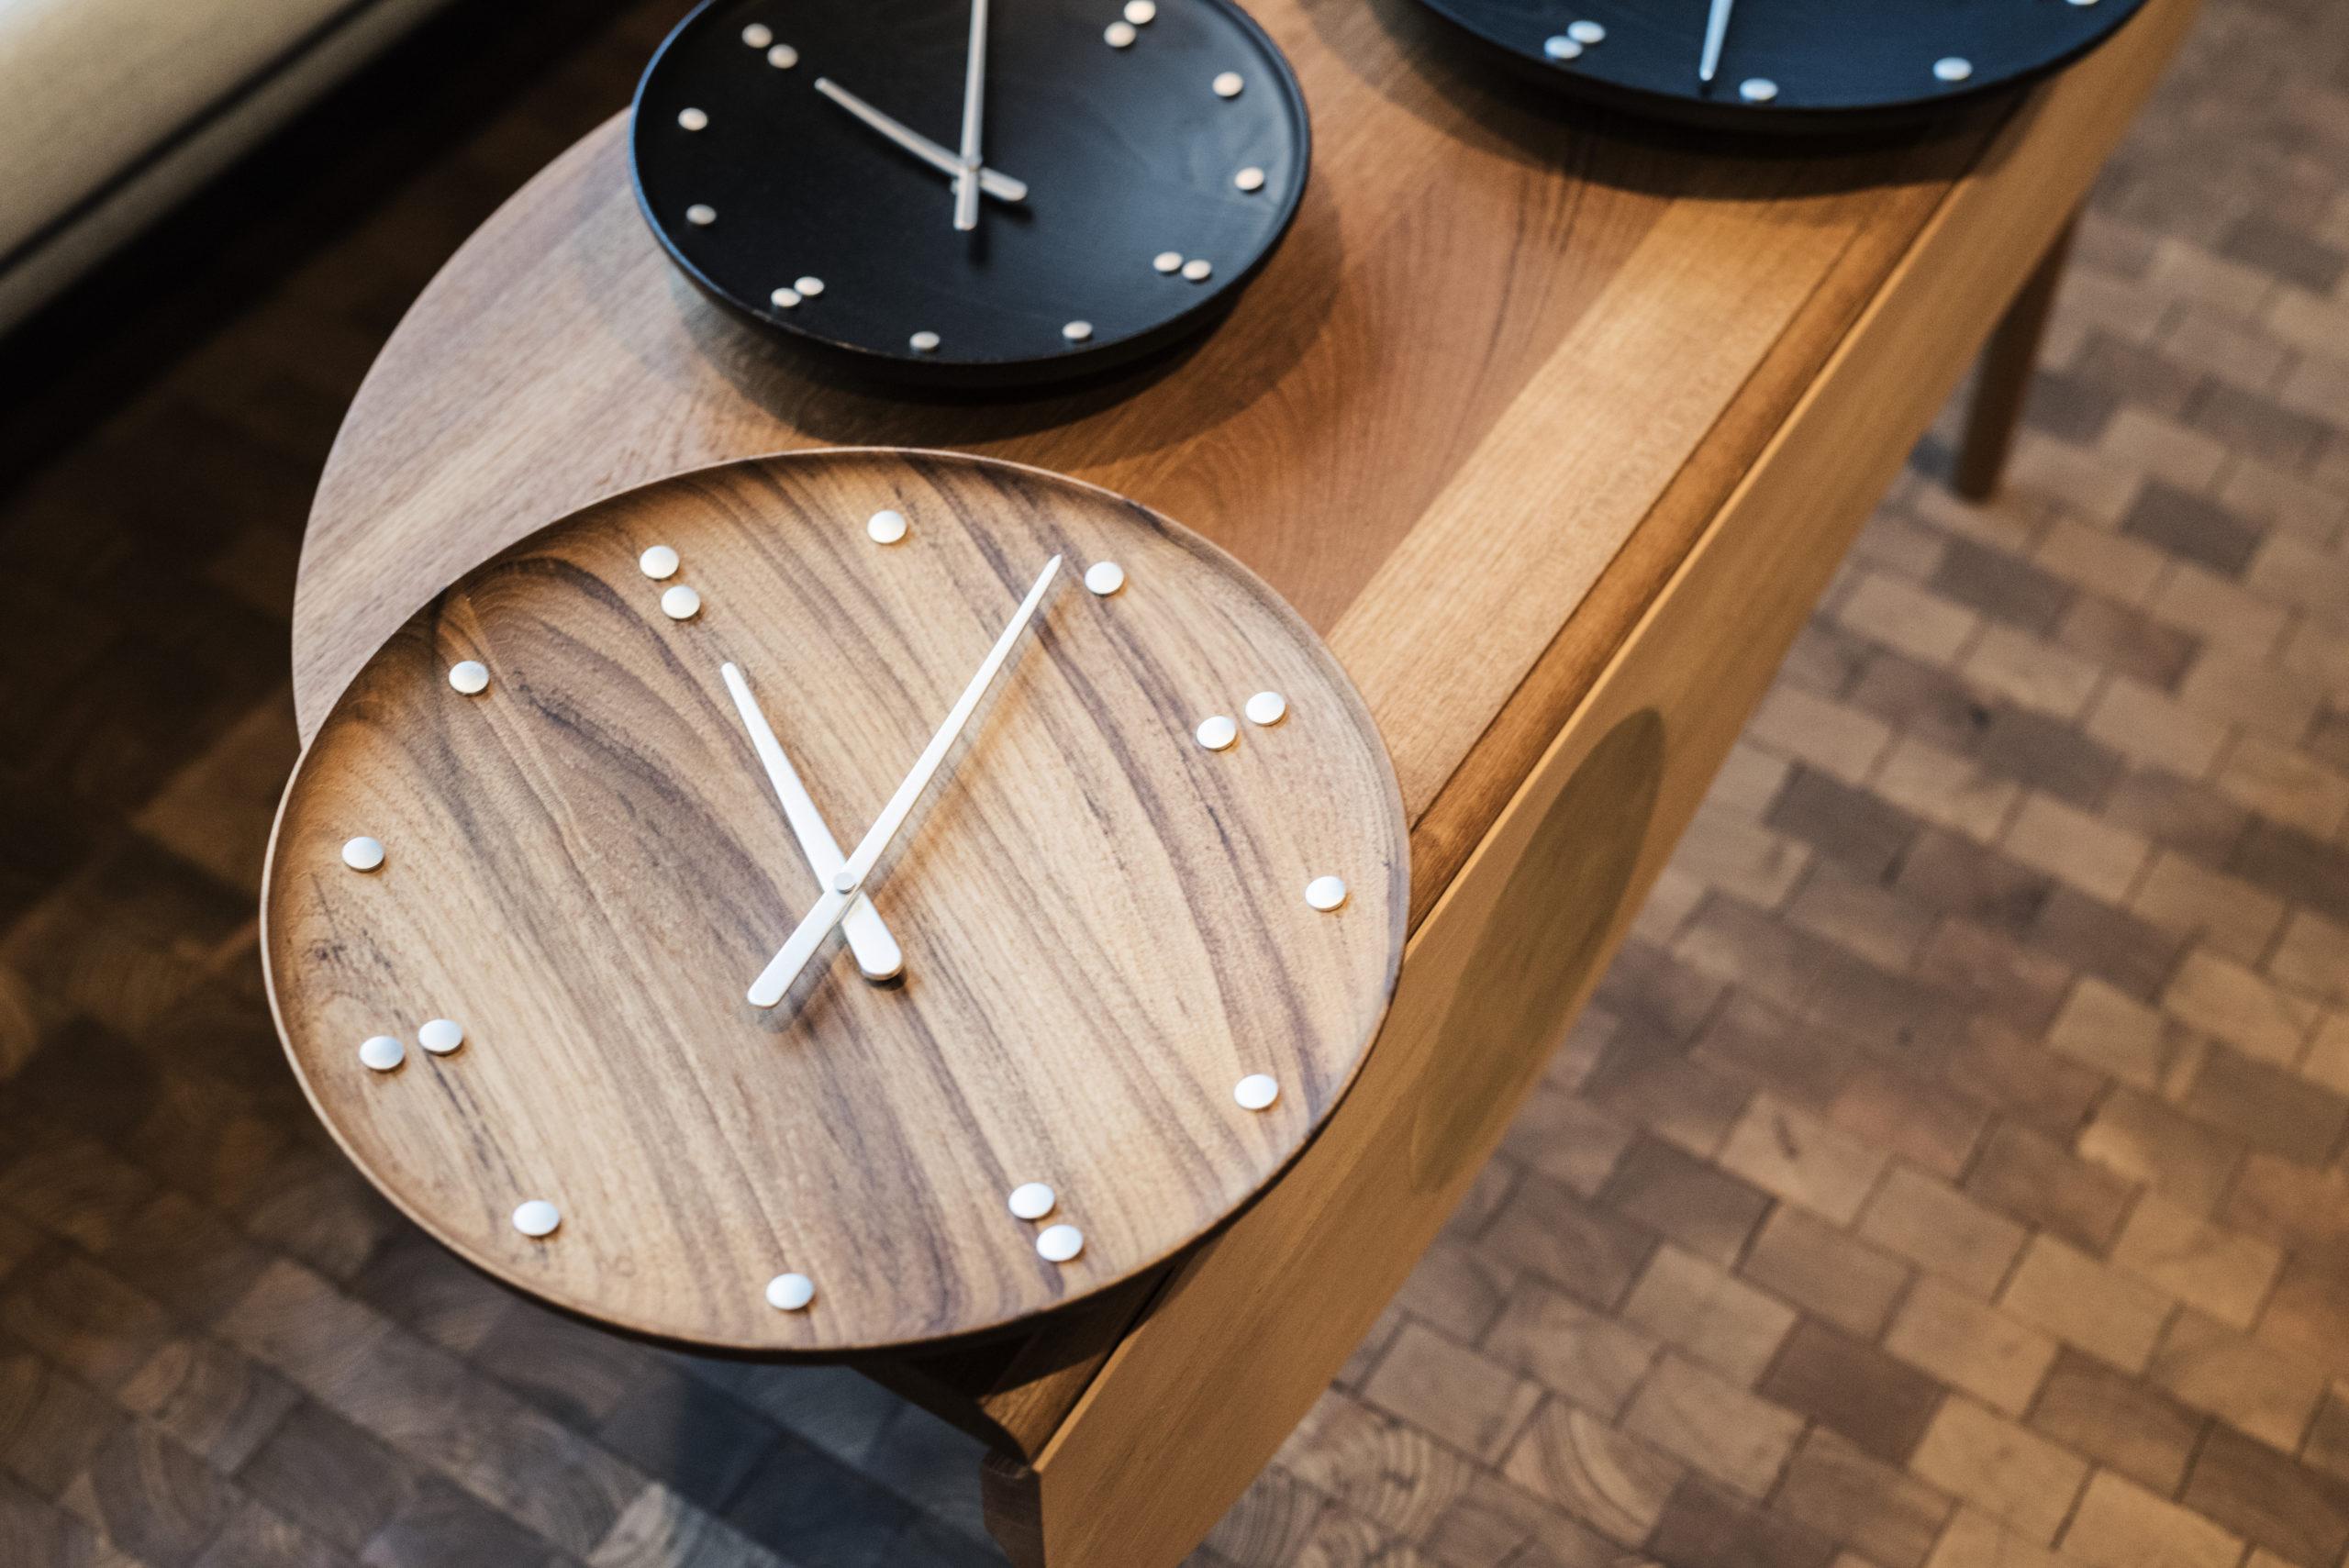 Architectmade-FJ-Clock-Wall-Clock-Teak-and-Ash-Wood-Denmark-Finn-Juhl-5